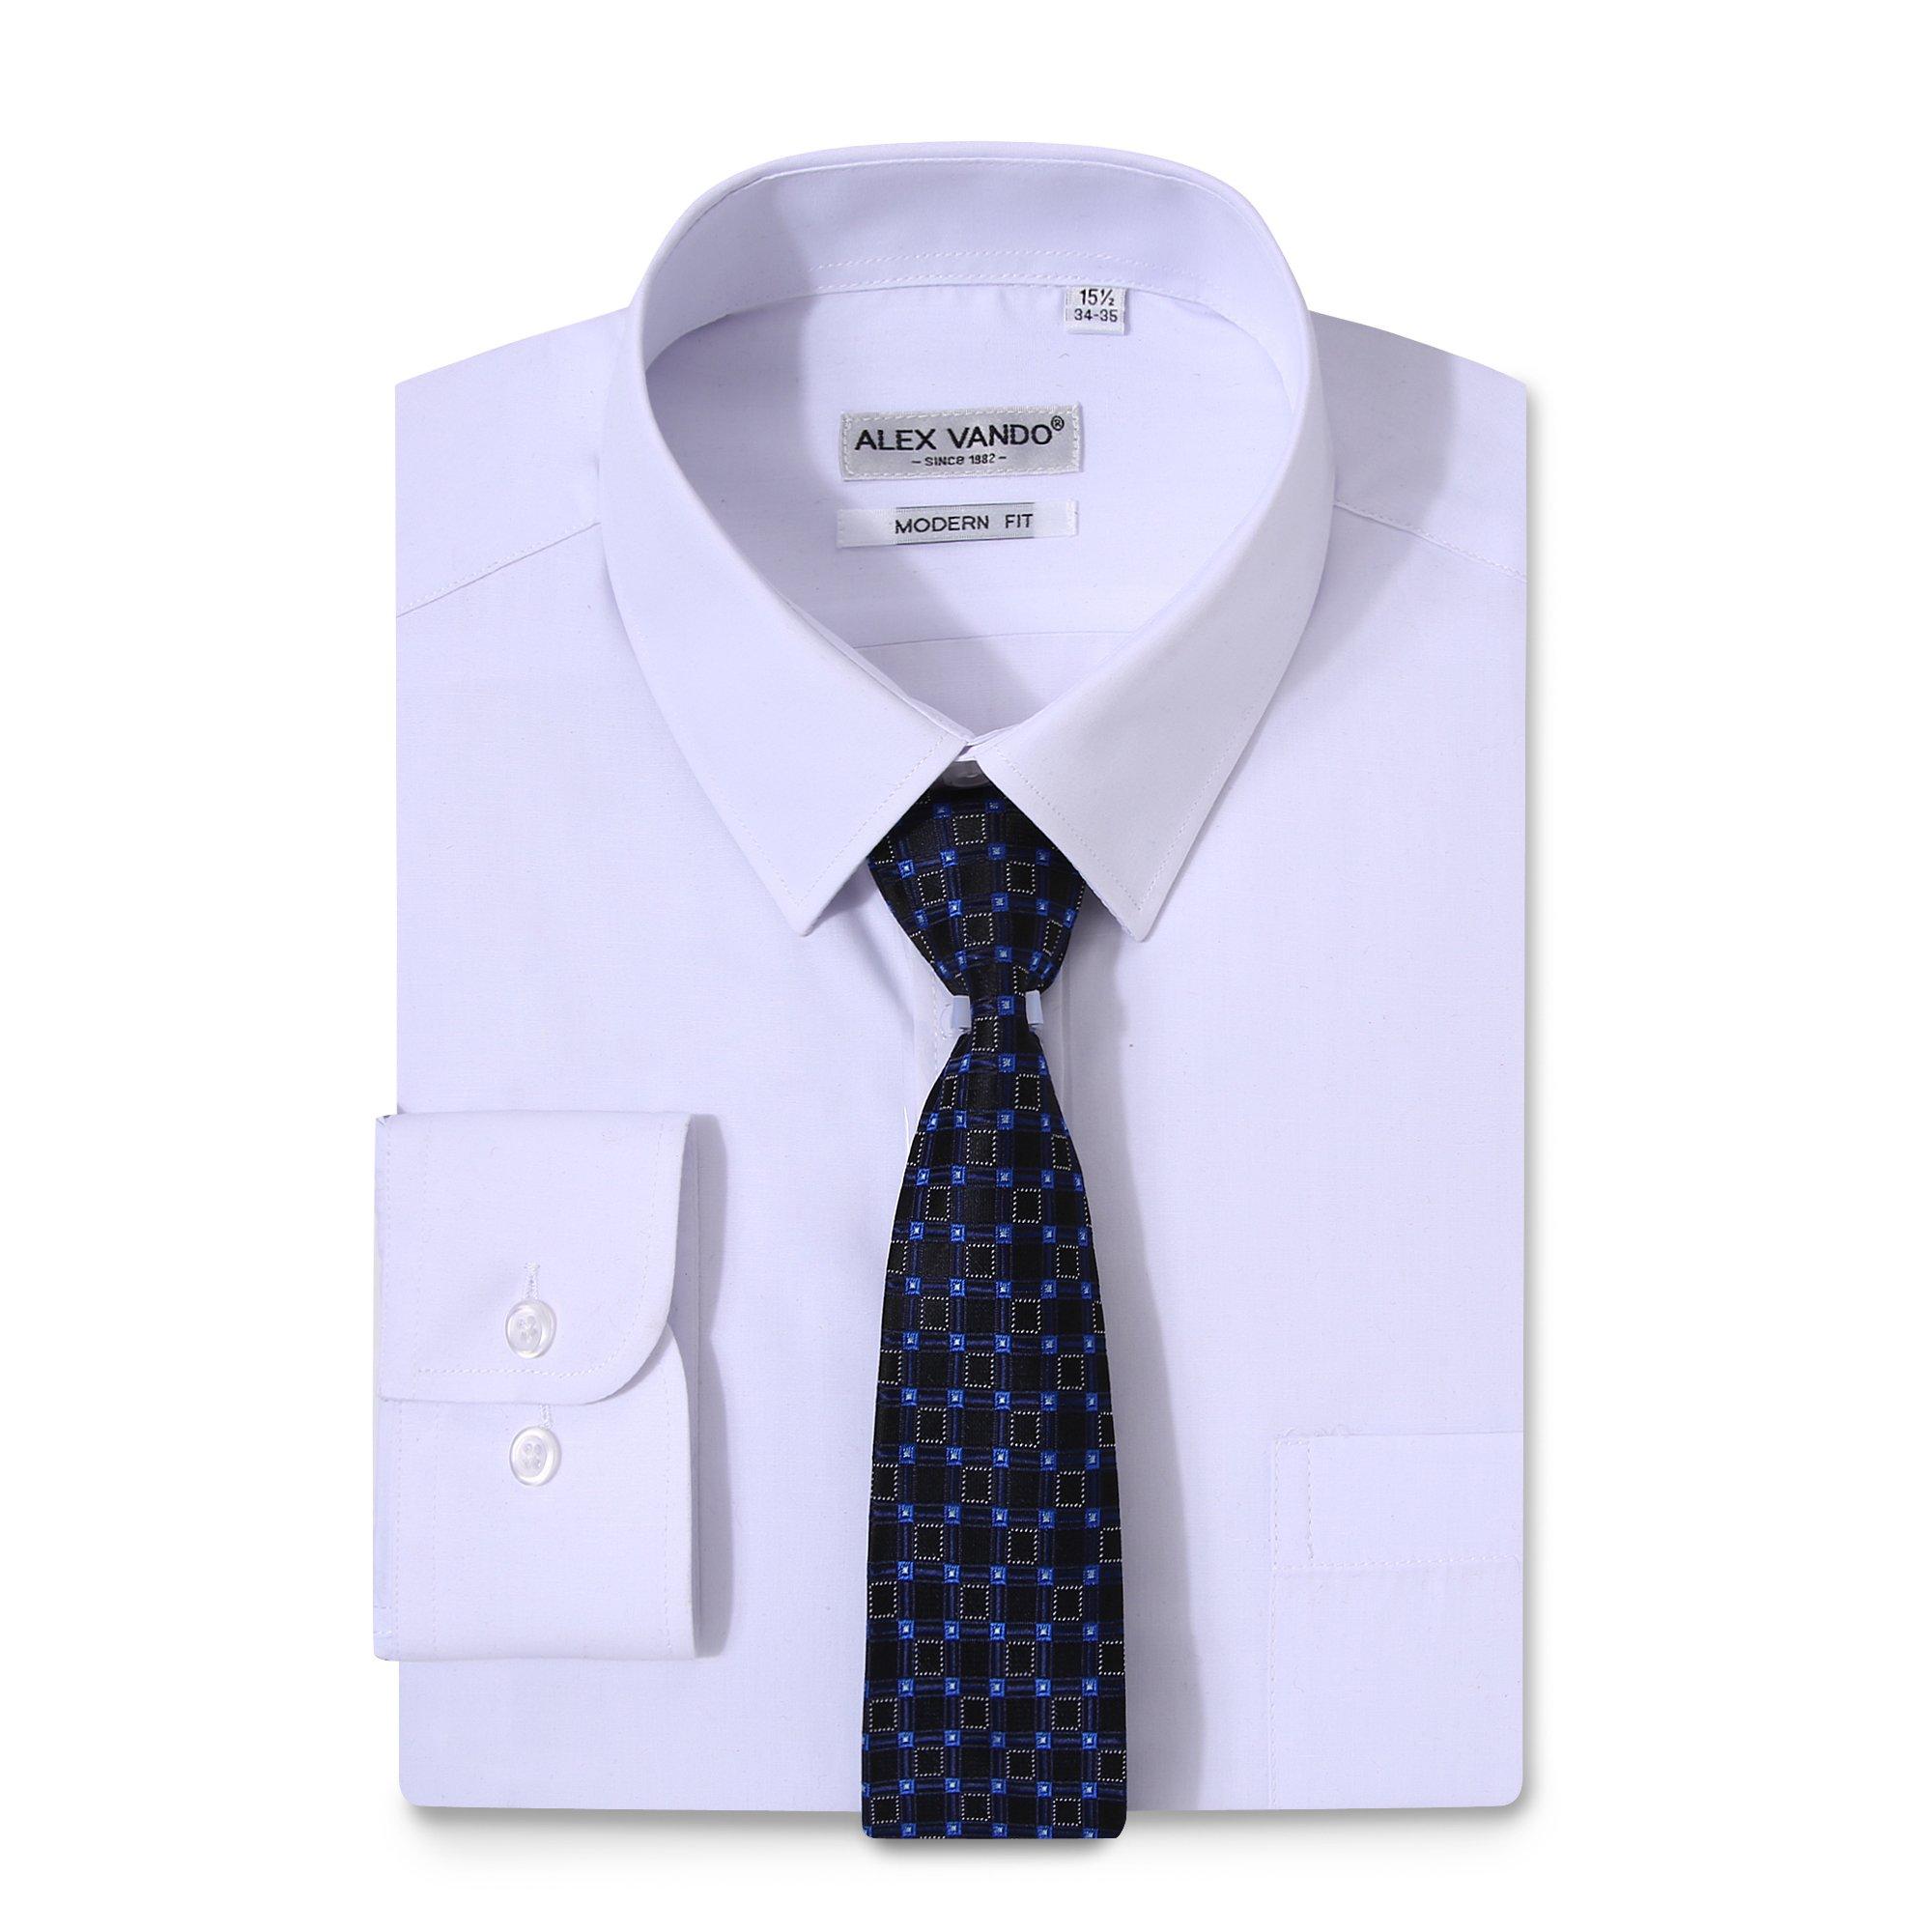 Alex Vando Mens Dress Shirts Solid Regular Fit Long Sleeve Point Collar Shirt,White,16.5 32/33